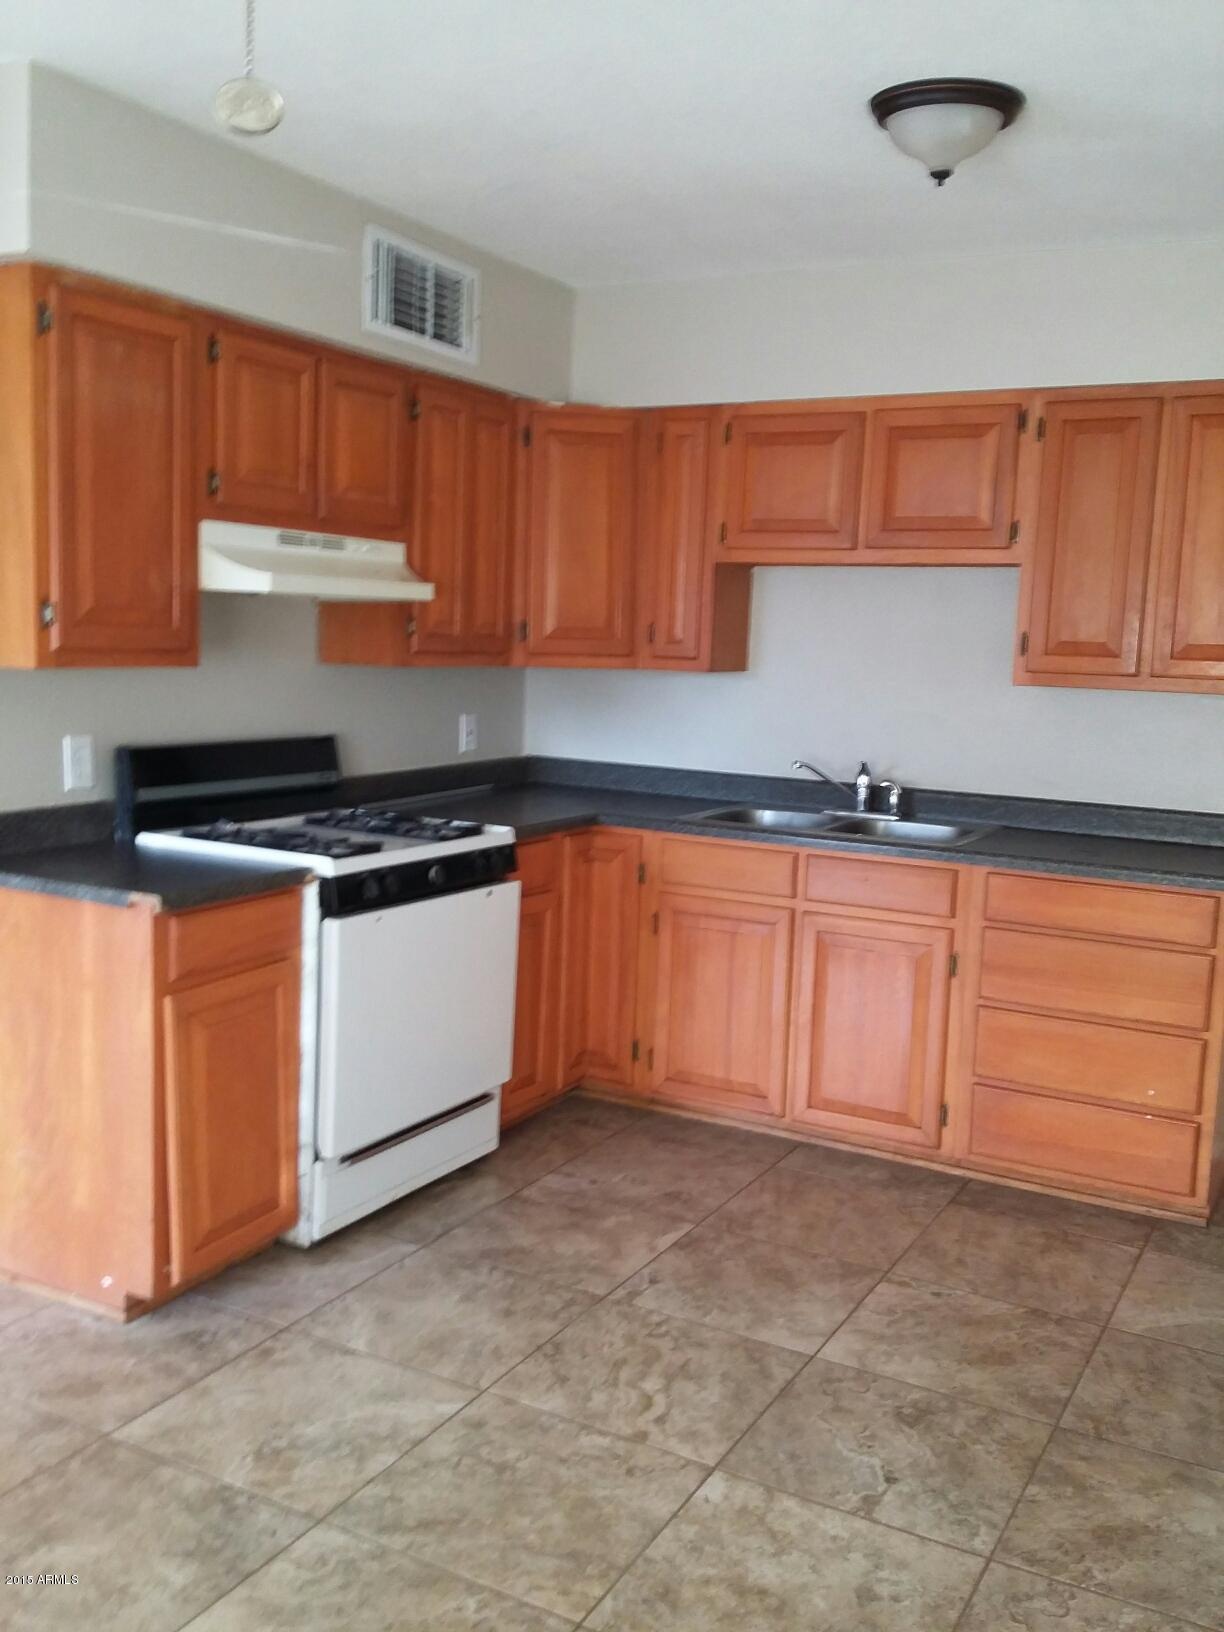 839 S MAIN Street Coolidge, AZ 85128 - MLS #: 5851407